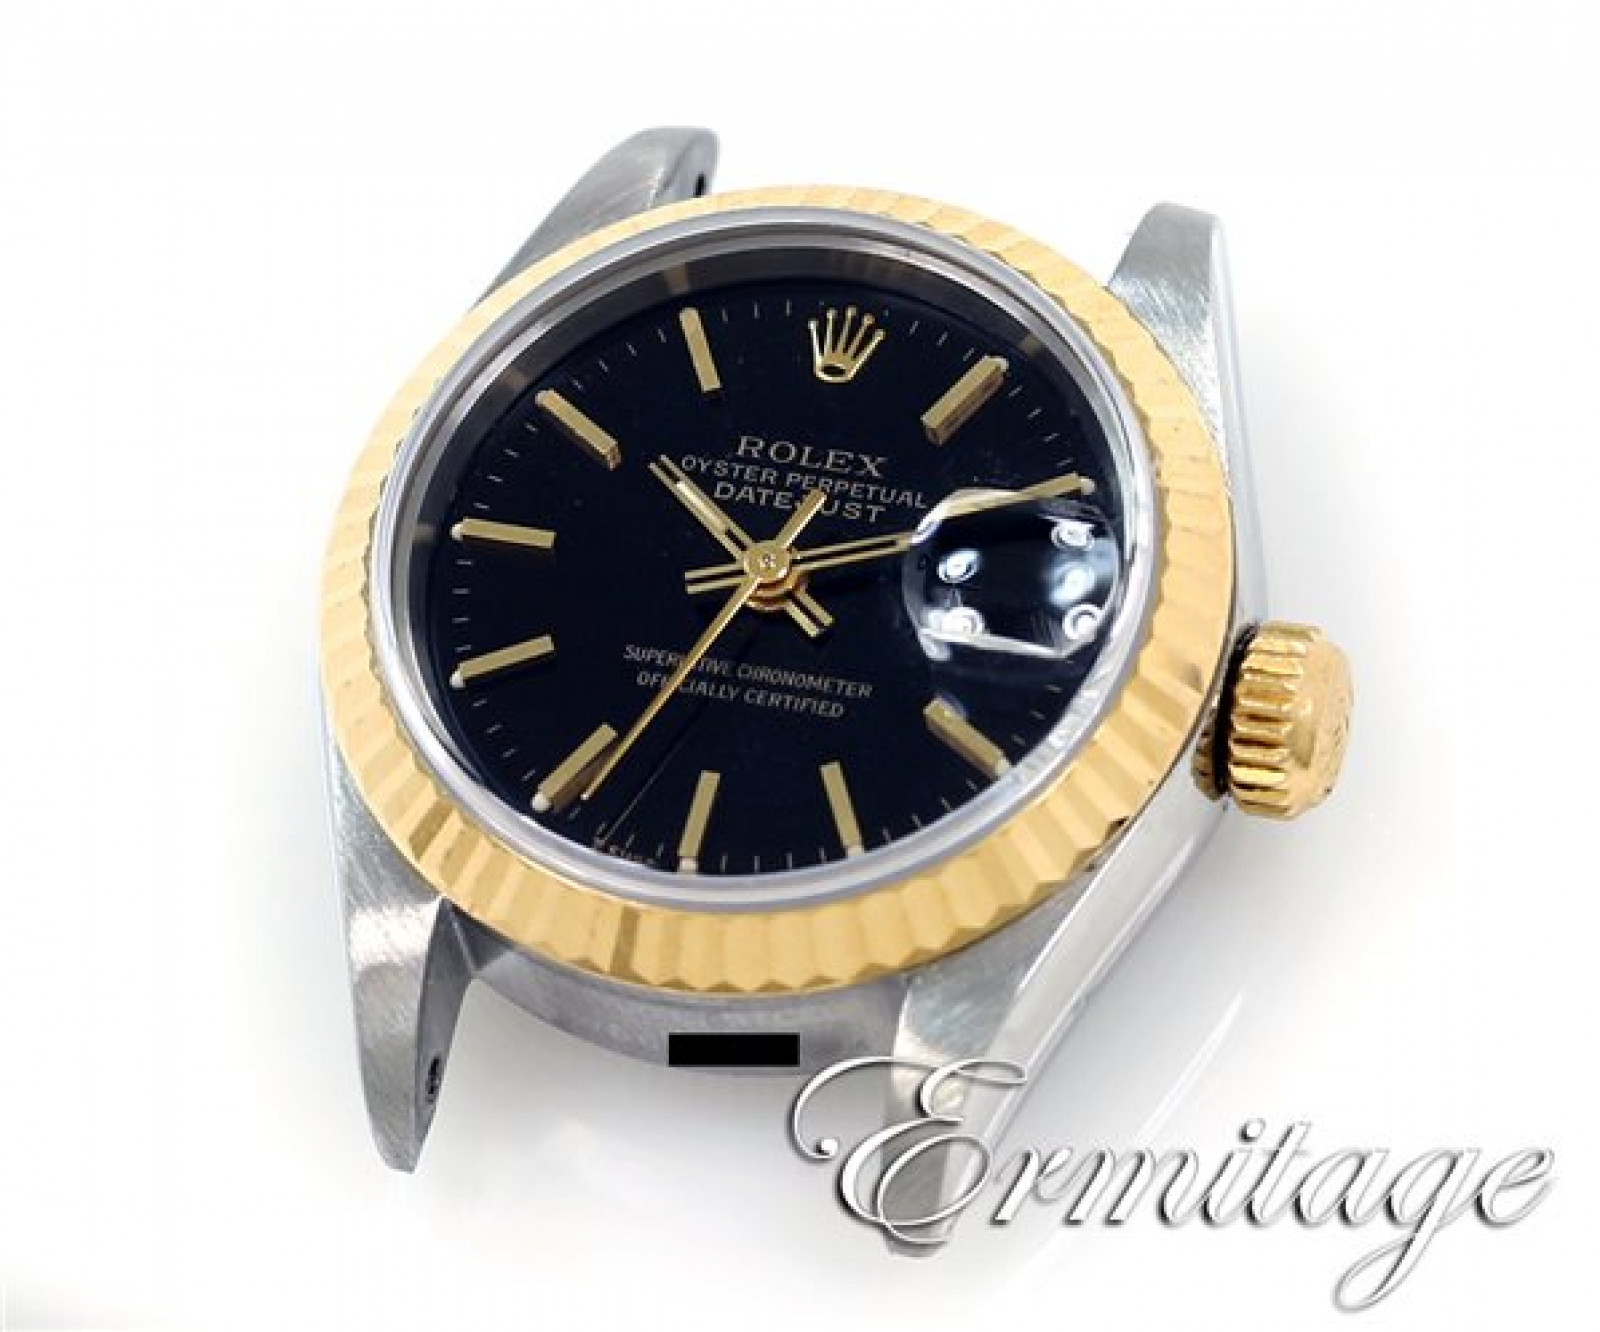 Classic Rolex Datejust 69173 Gold & Steel